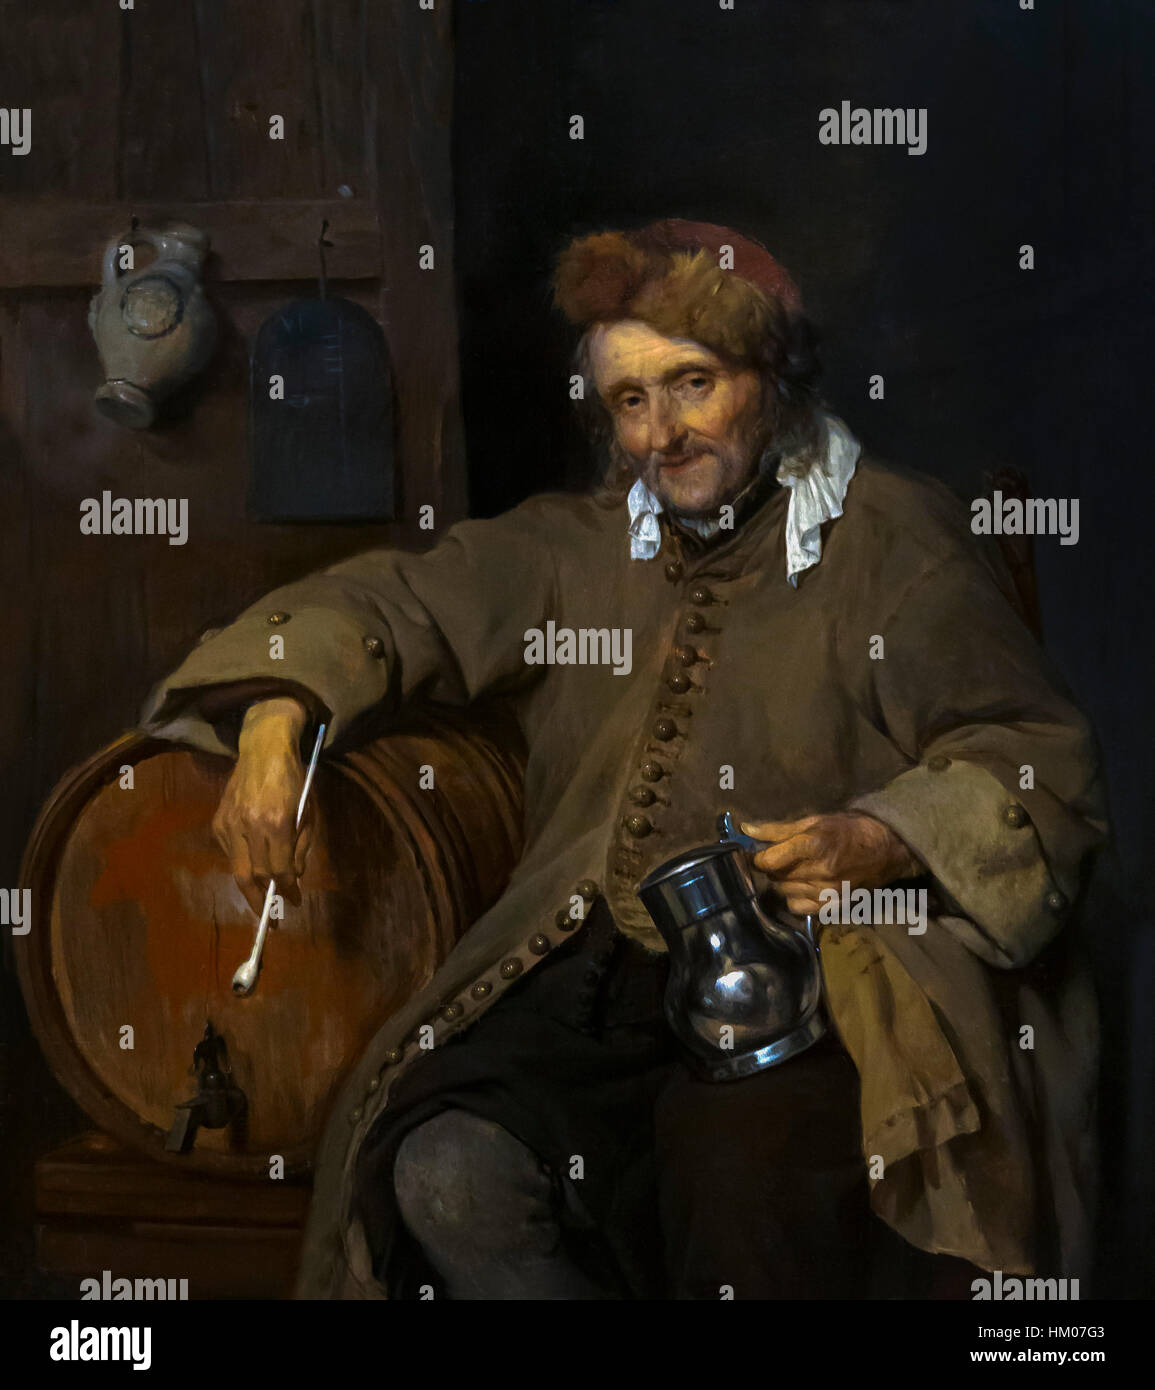 The Old Drinker, by Gabriel Metsu, circa 1661-63, oil on panel, Rijksmuseum, Amsterdam, Netherlands, Europe, Stock Photo